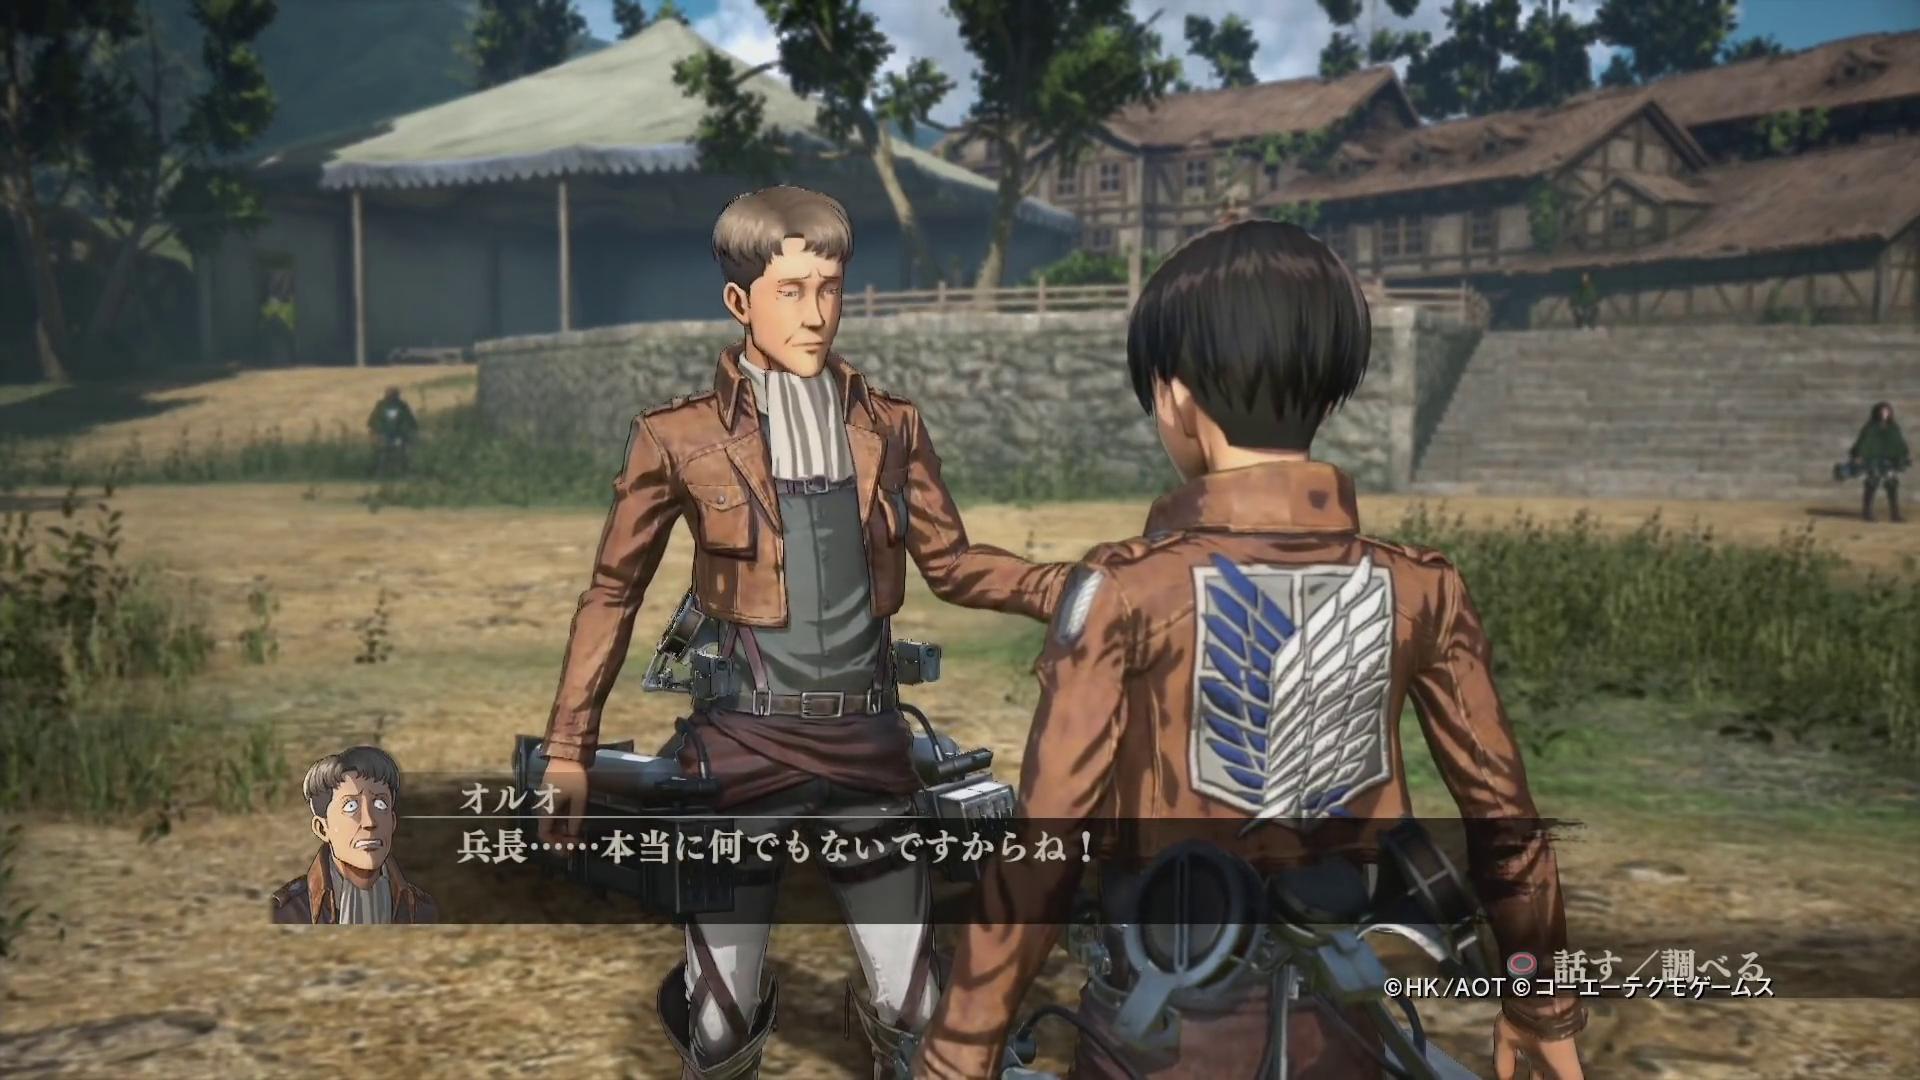 vlcsnap-2015-11-27-16h20m36s303 Koei Tecmo Attack on Titan Gameplay Trailer